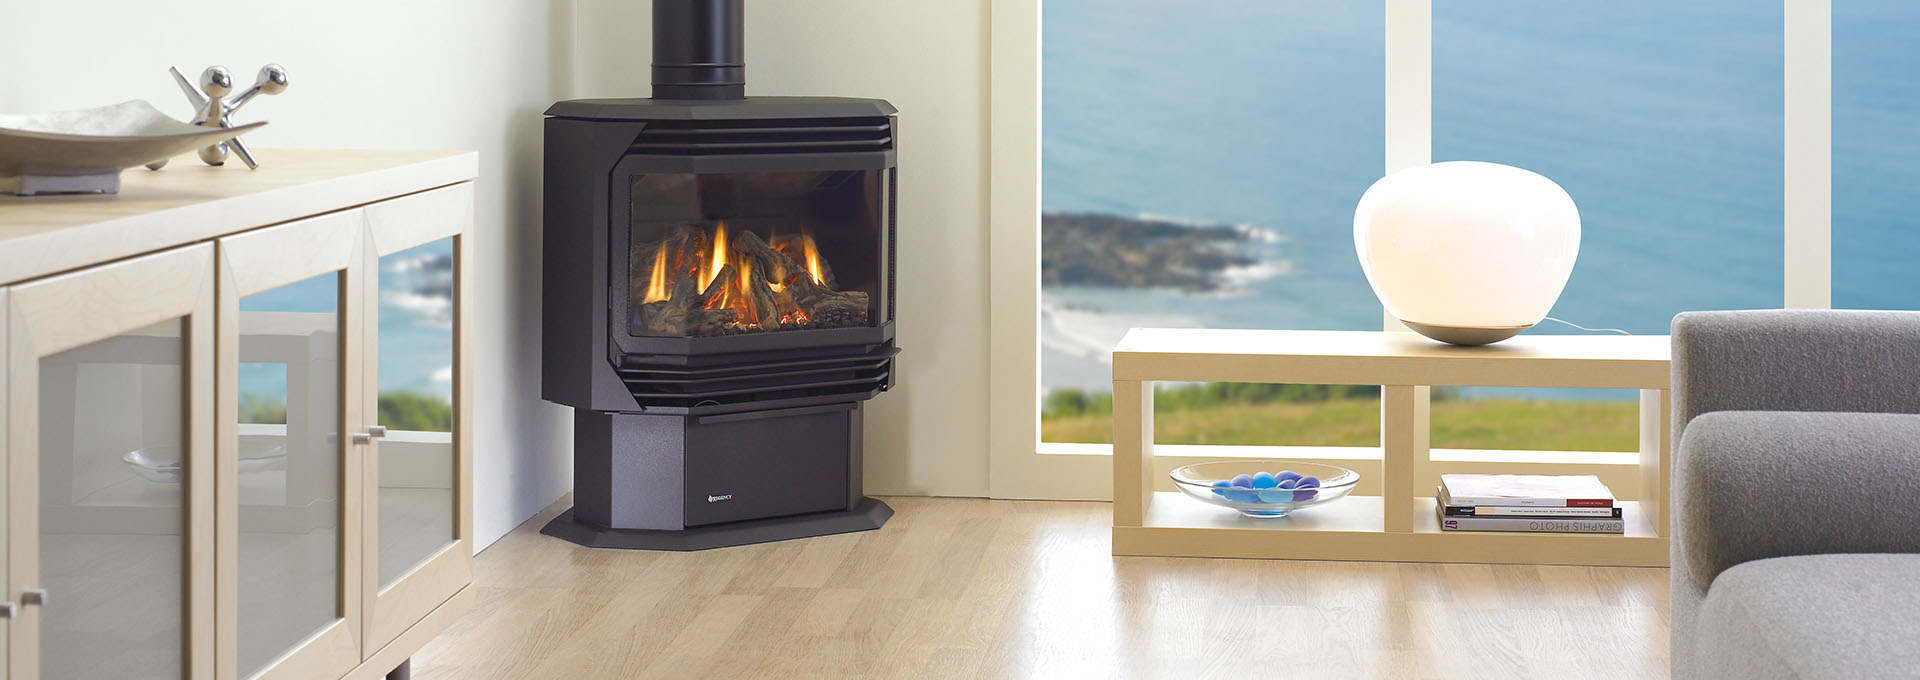 Corner Gas Fireplace Canada Gas Fireplace Ideas Fireplaces